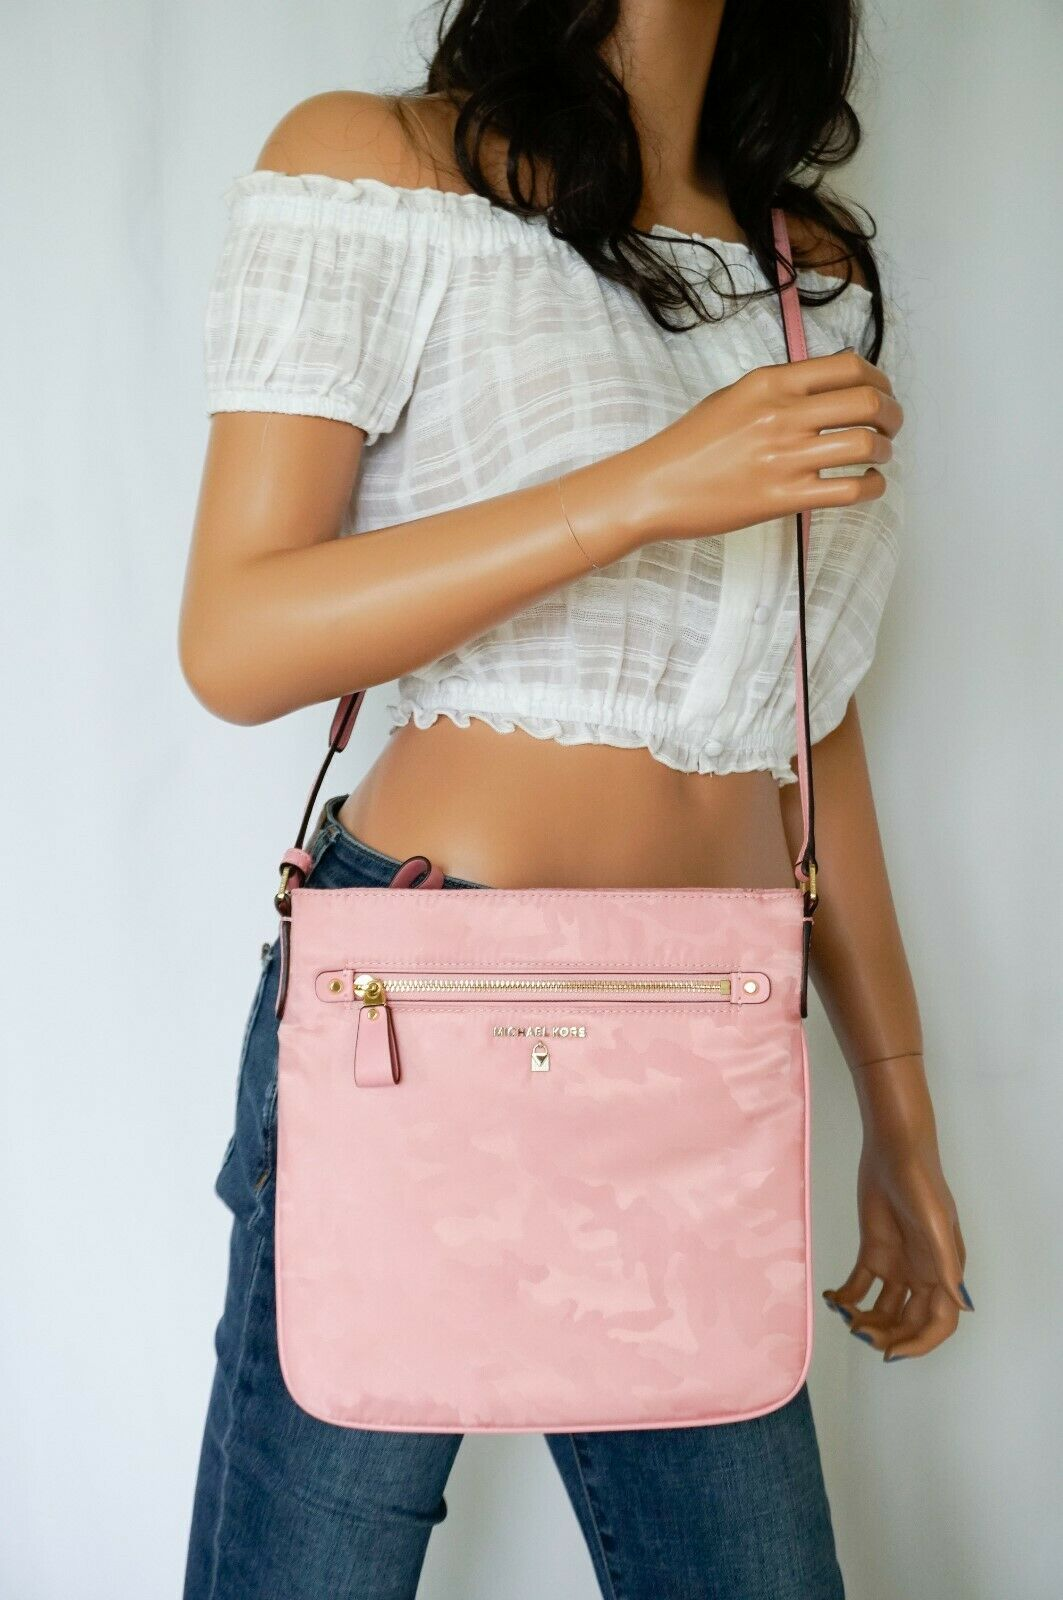 Michael Kors Nylon Kelsey Large Flat Crossbody Bag Swingpack